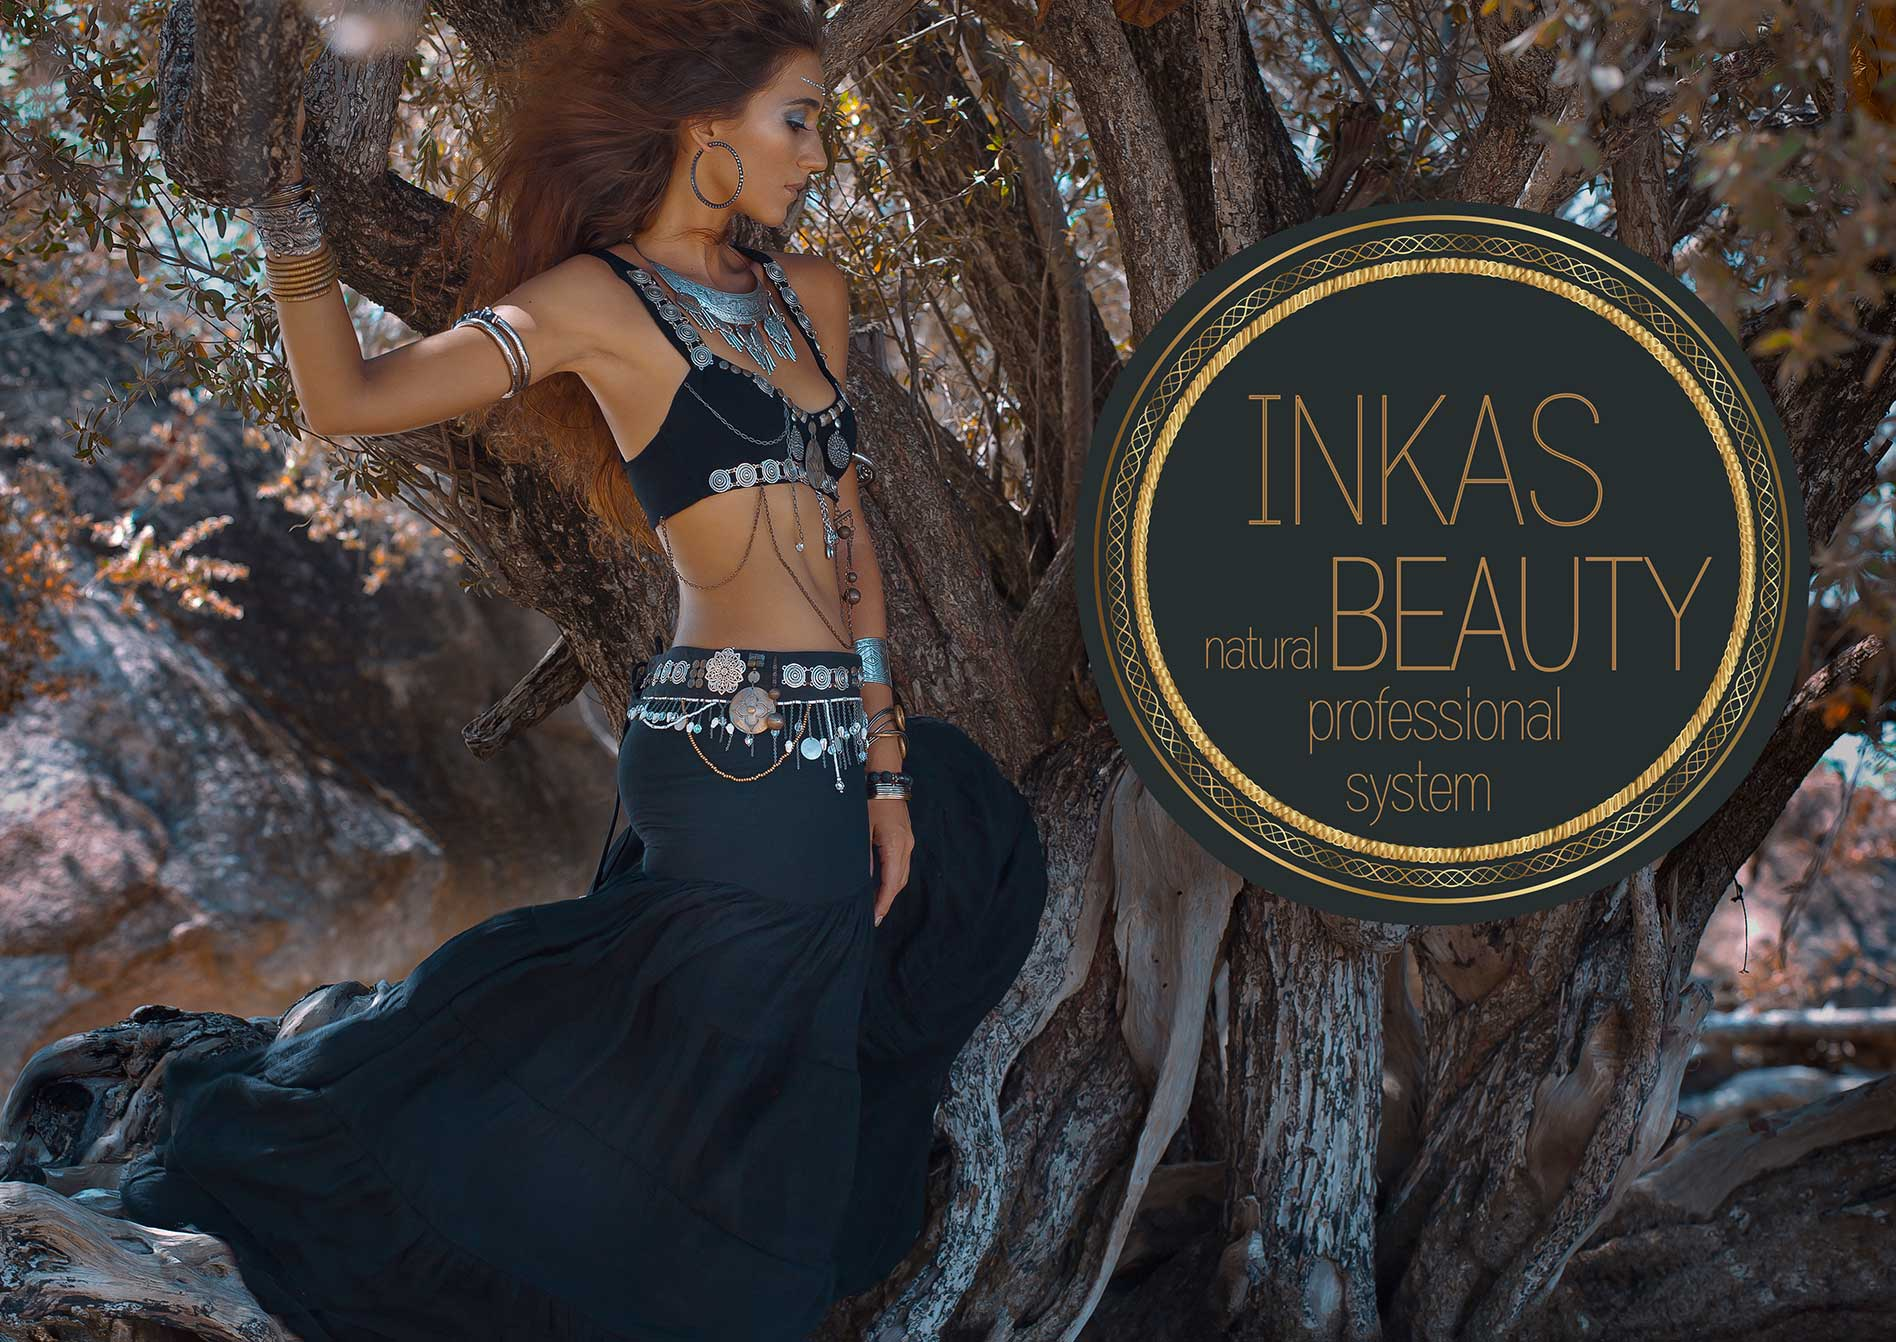 Inkas Beauty Concept